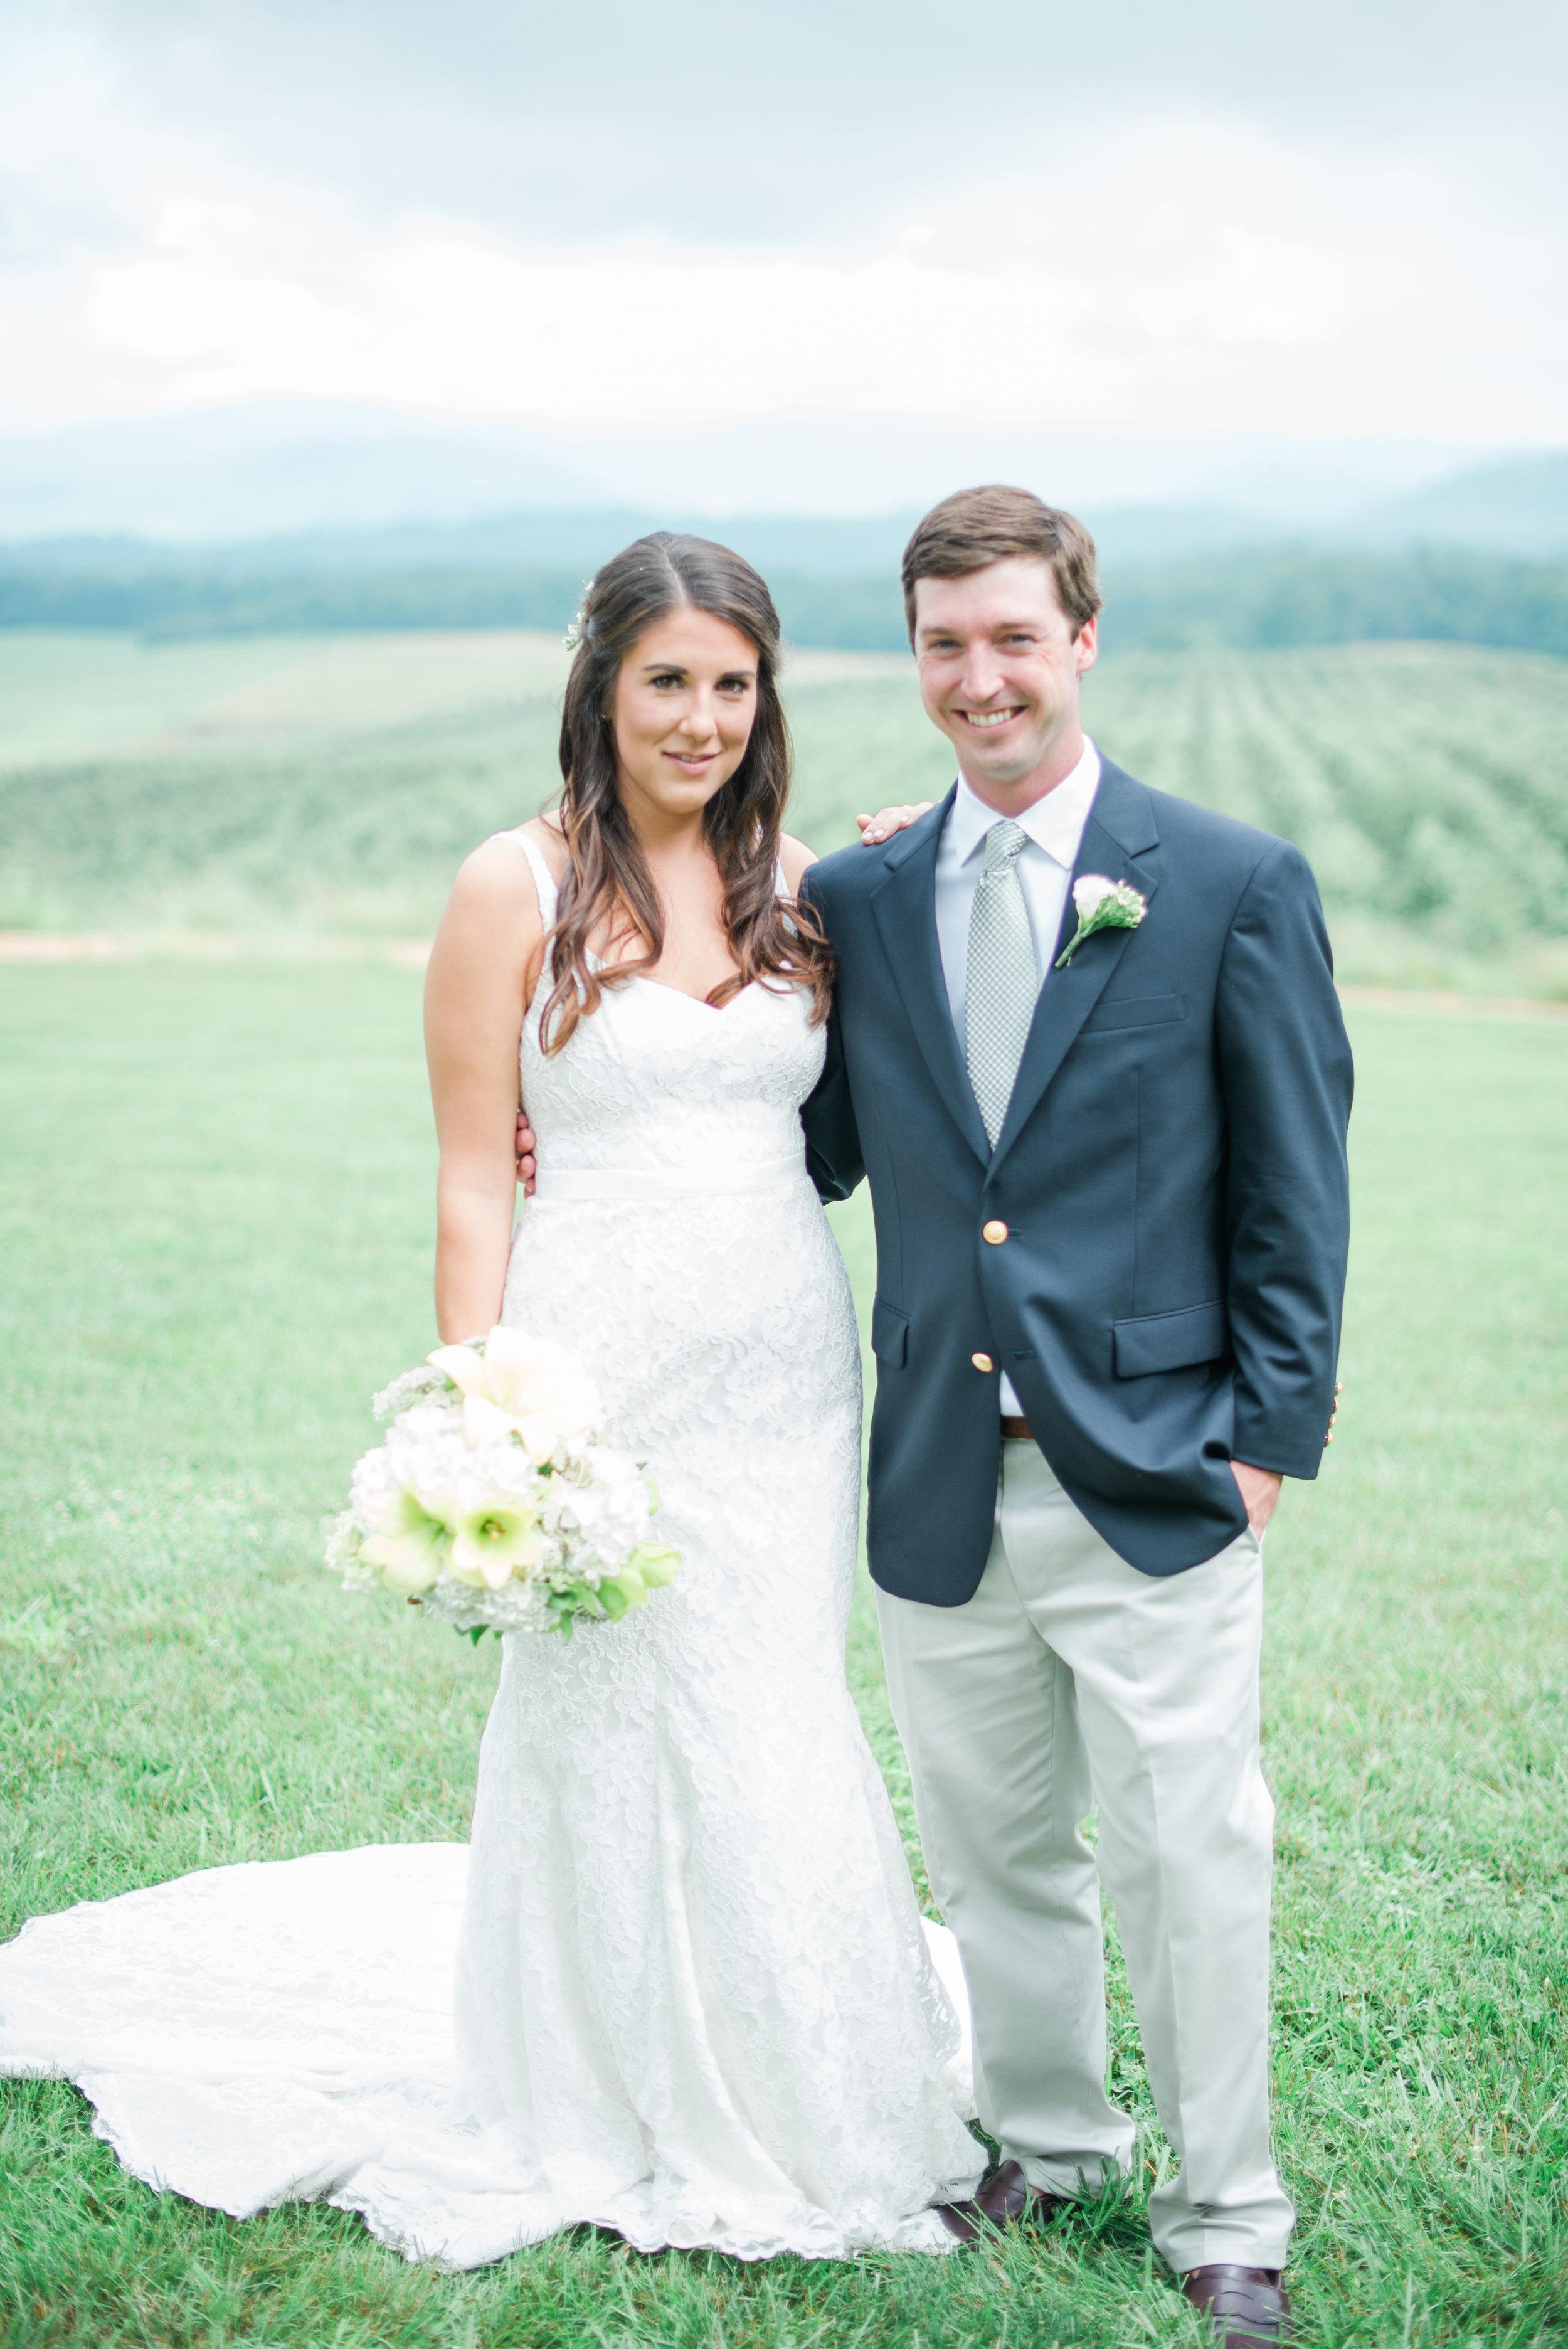 062715-Hannah+Drew-pharsalia-wedding-kathryn-ivy-photography-68.jpg